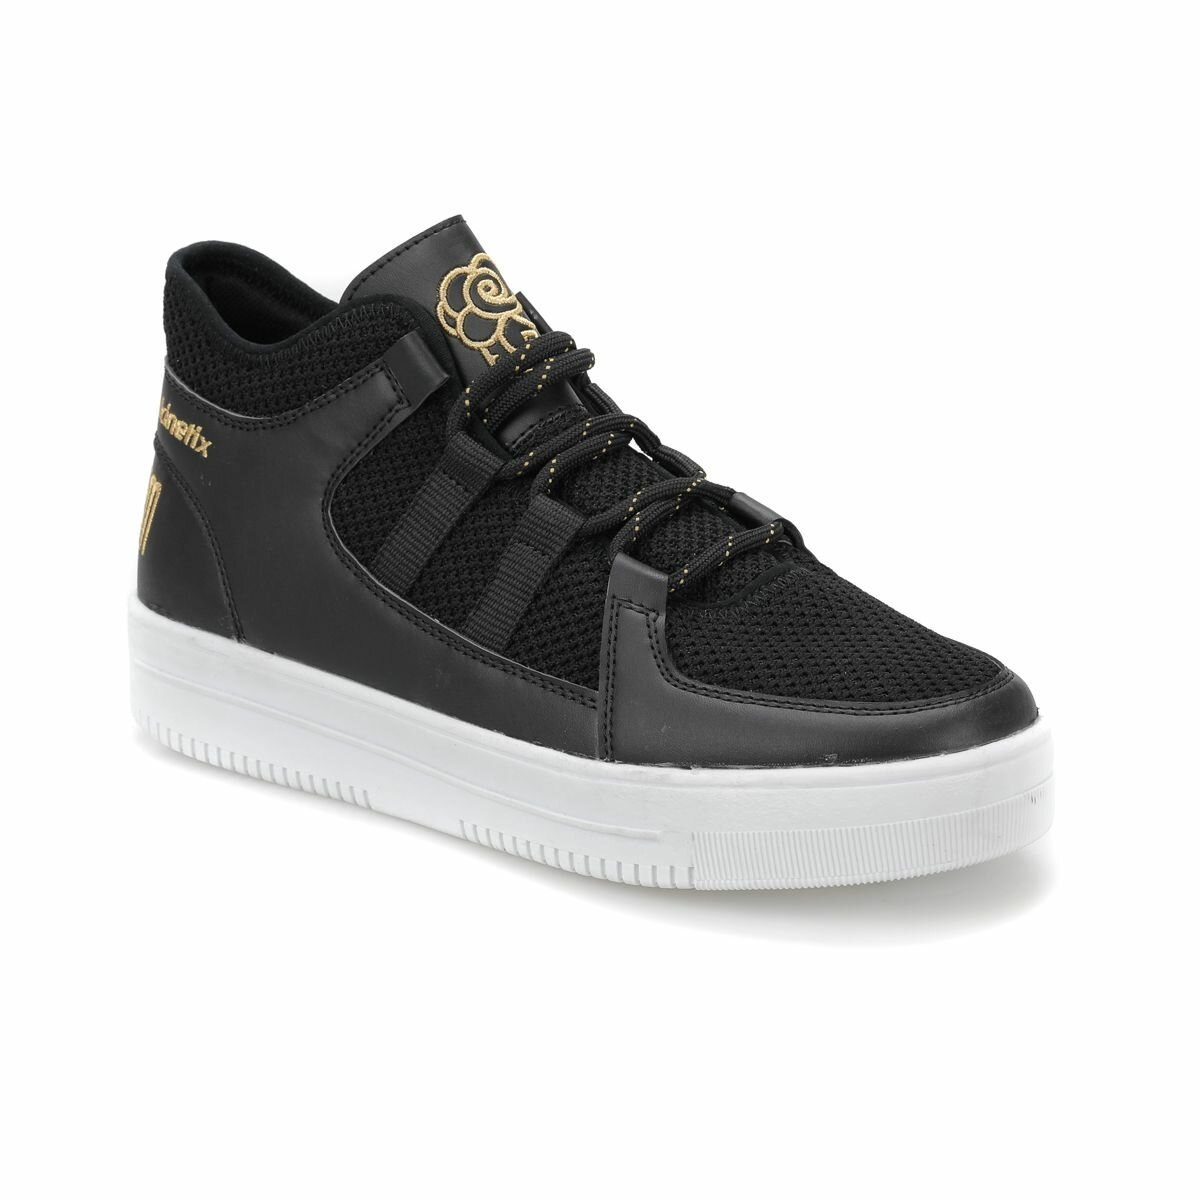 FLO GAZAPIZM Black Women 'S Sneaker Shoes KINETIX